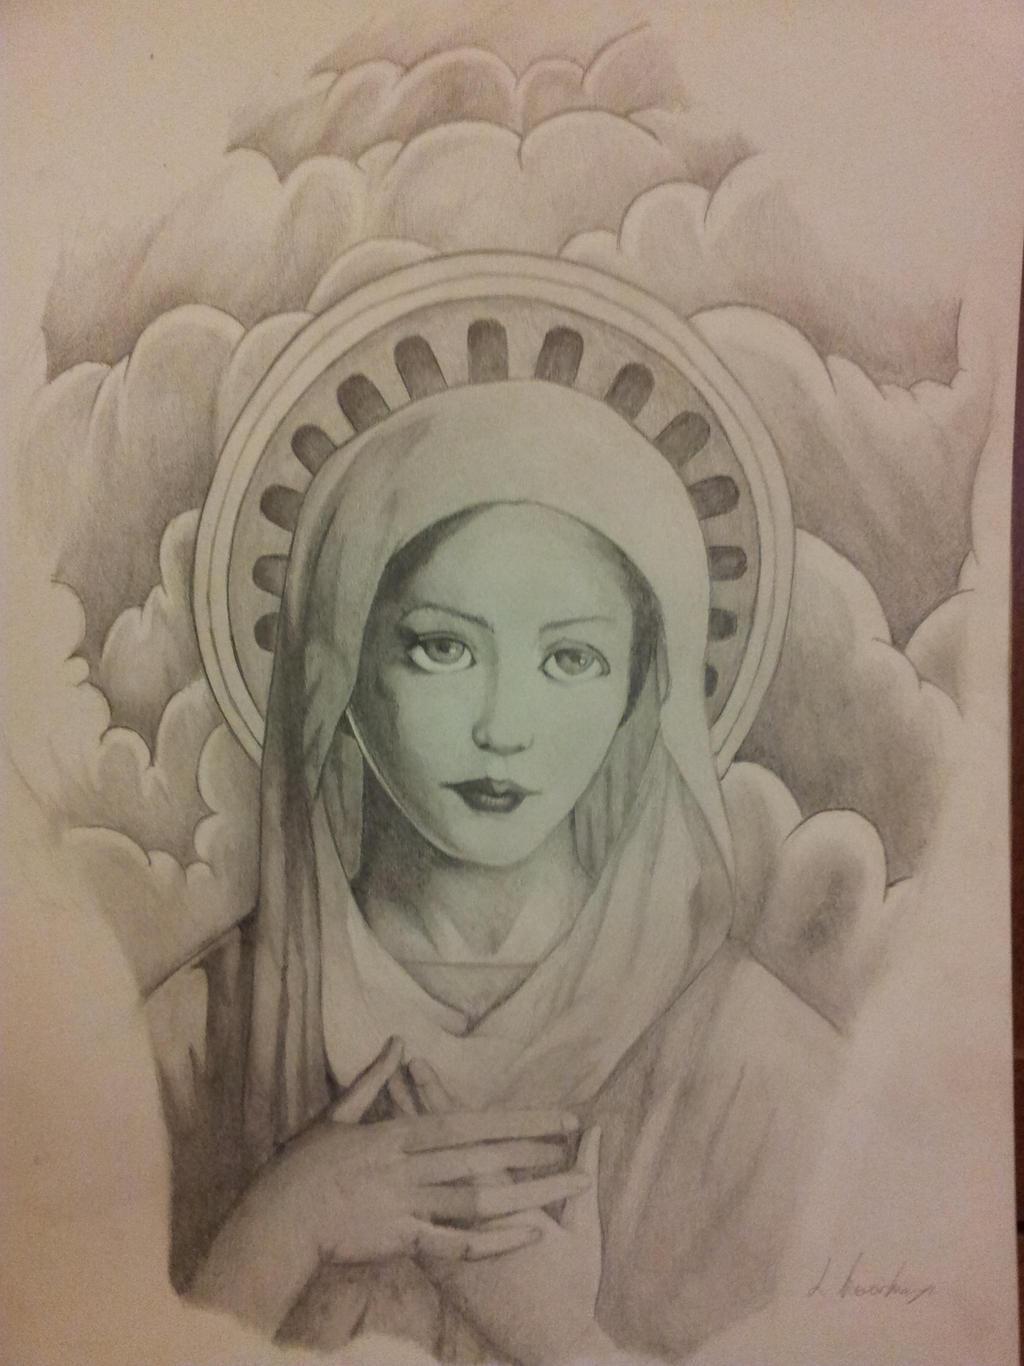 Virgin Mary by kaz-zan on DeviantArt